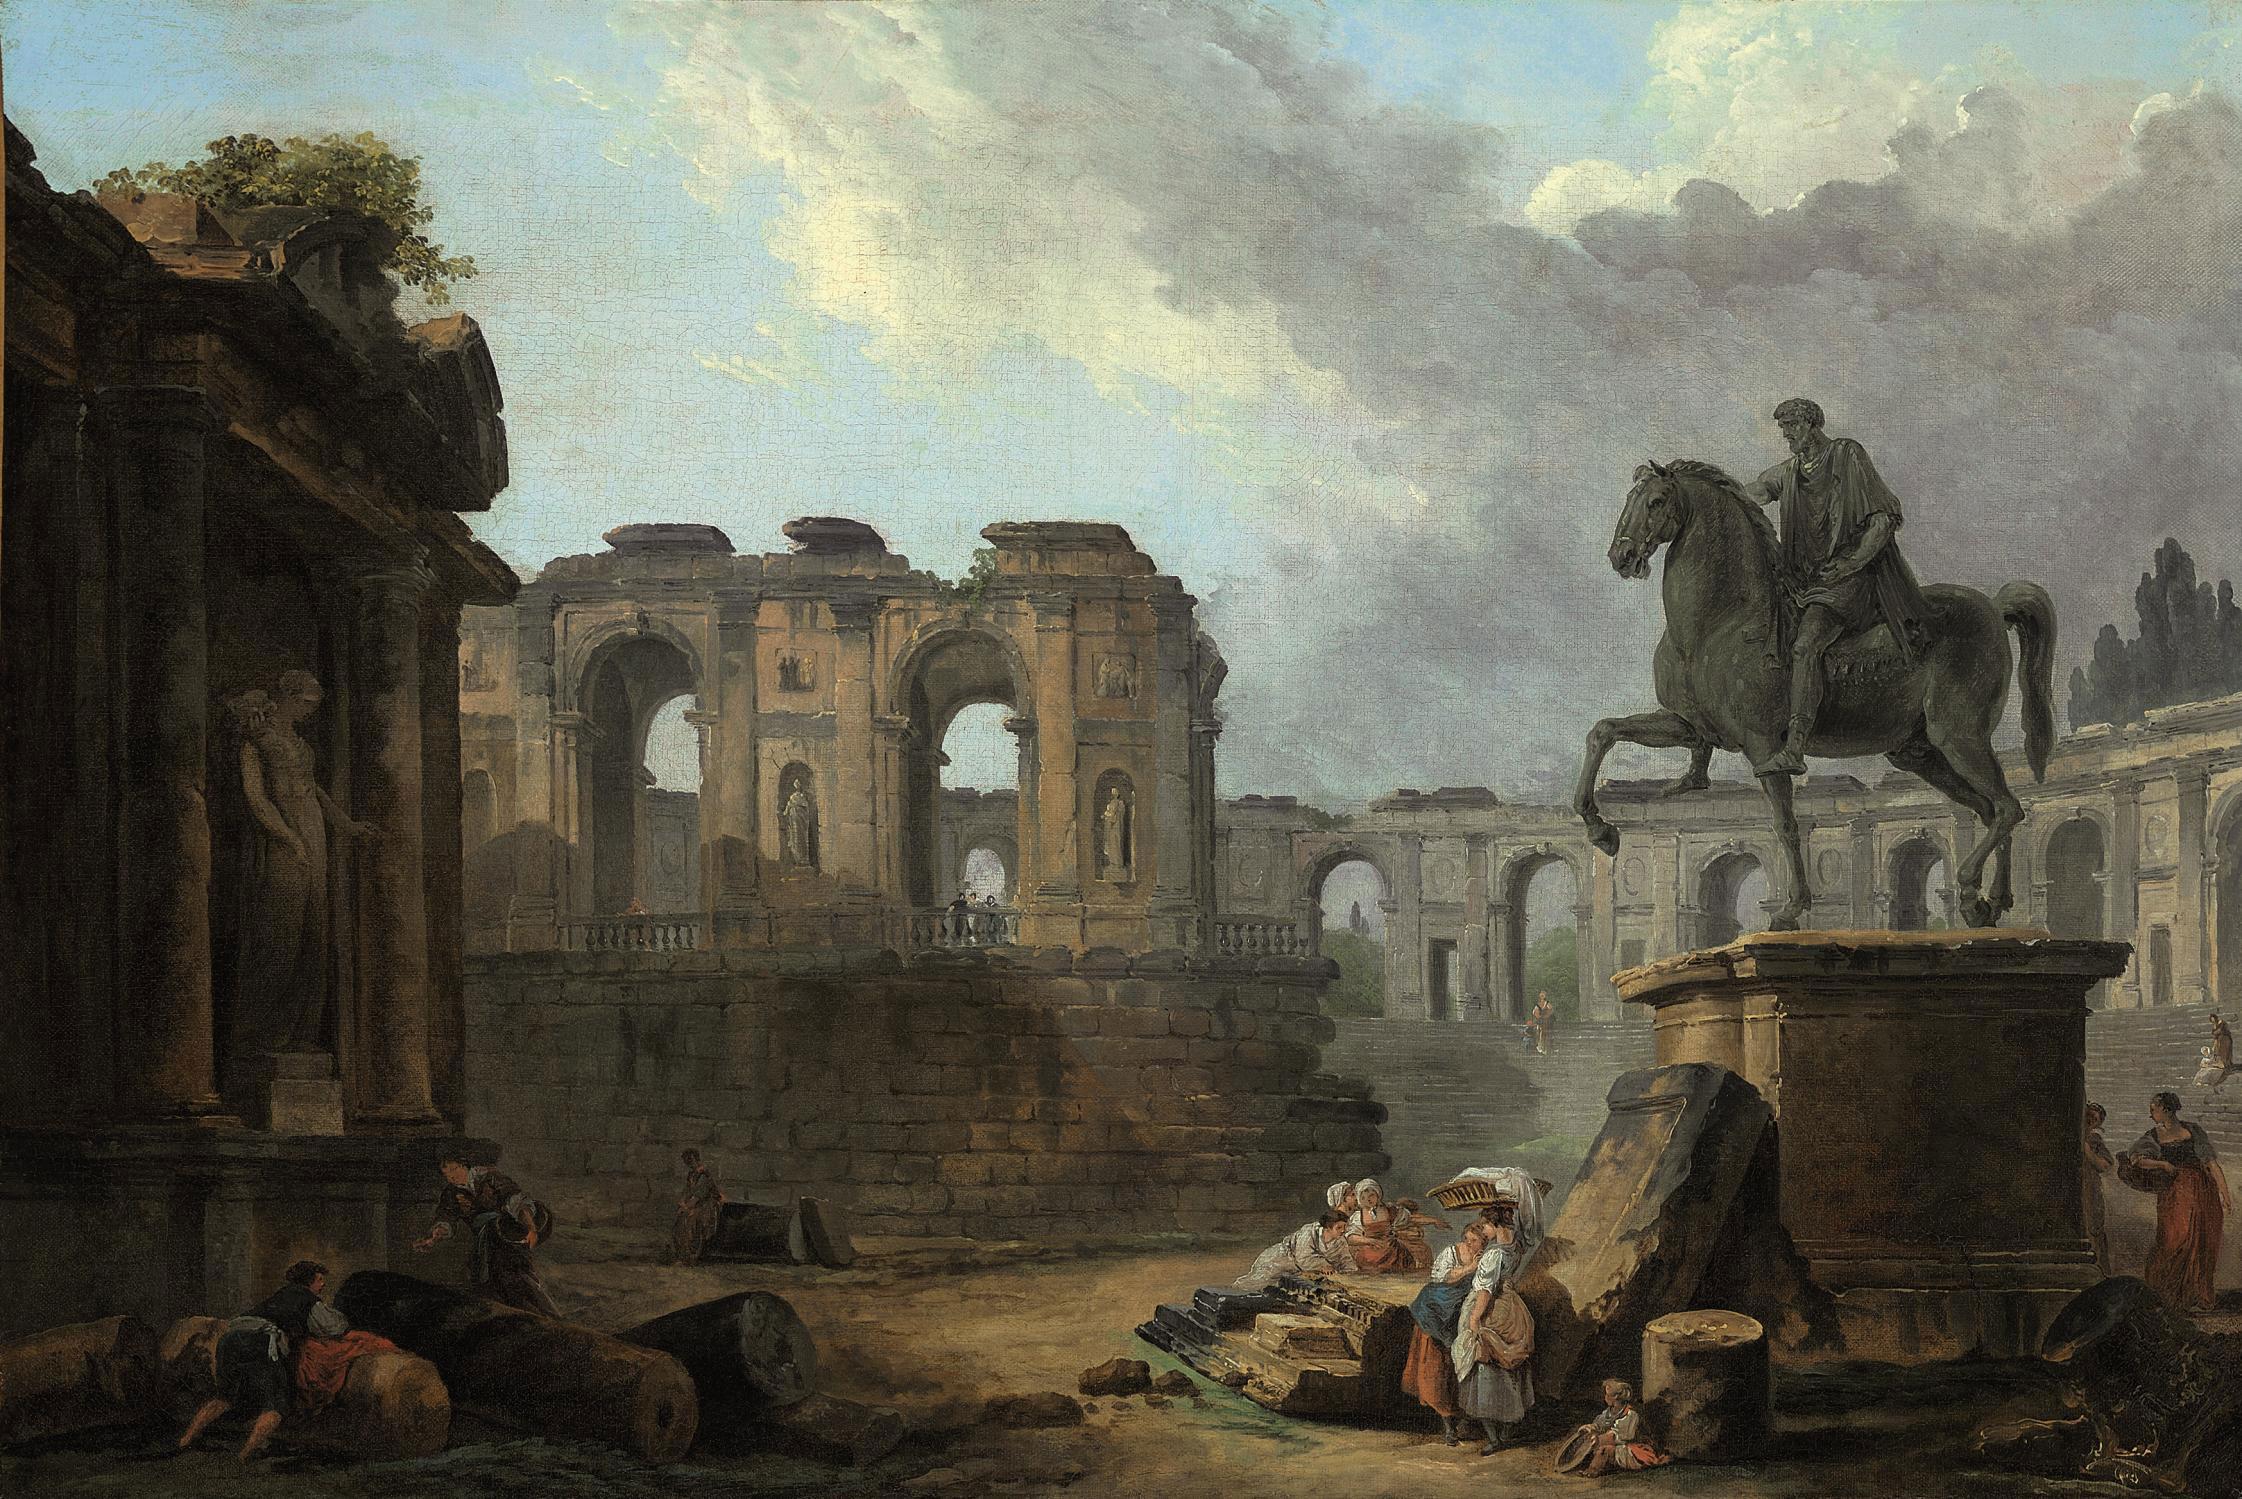 Estoicos – 4 Virtudes